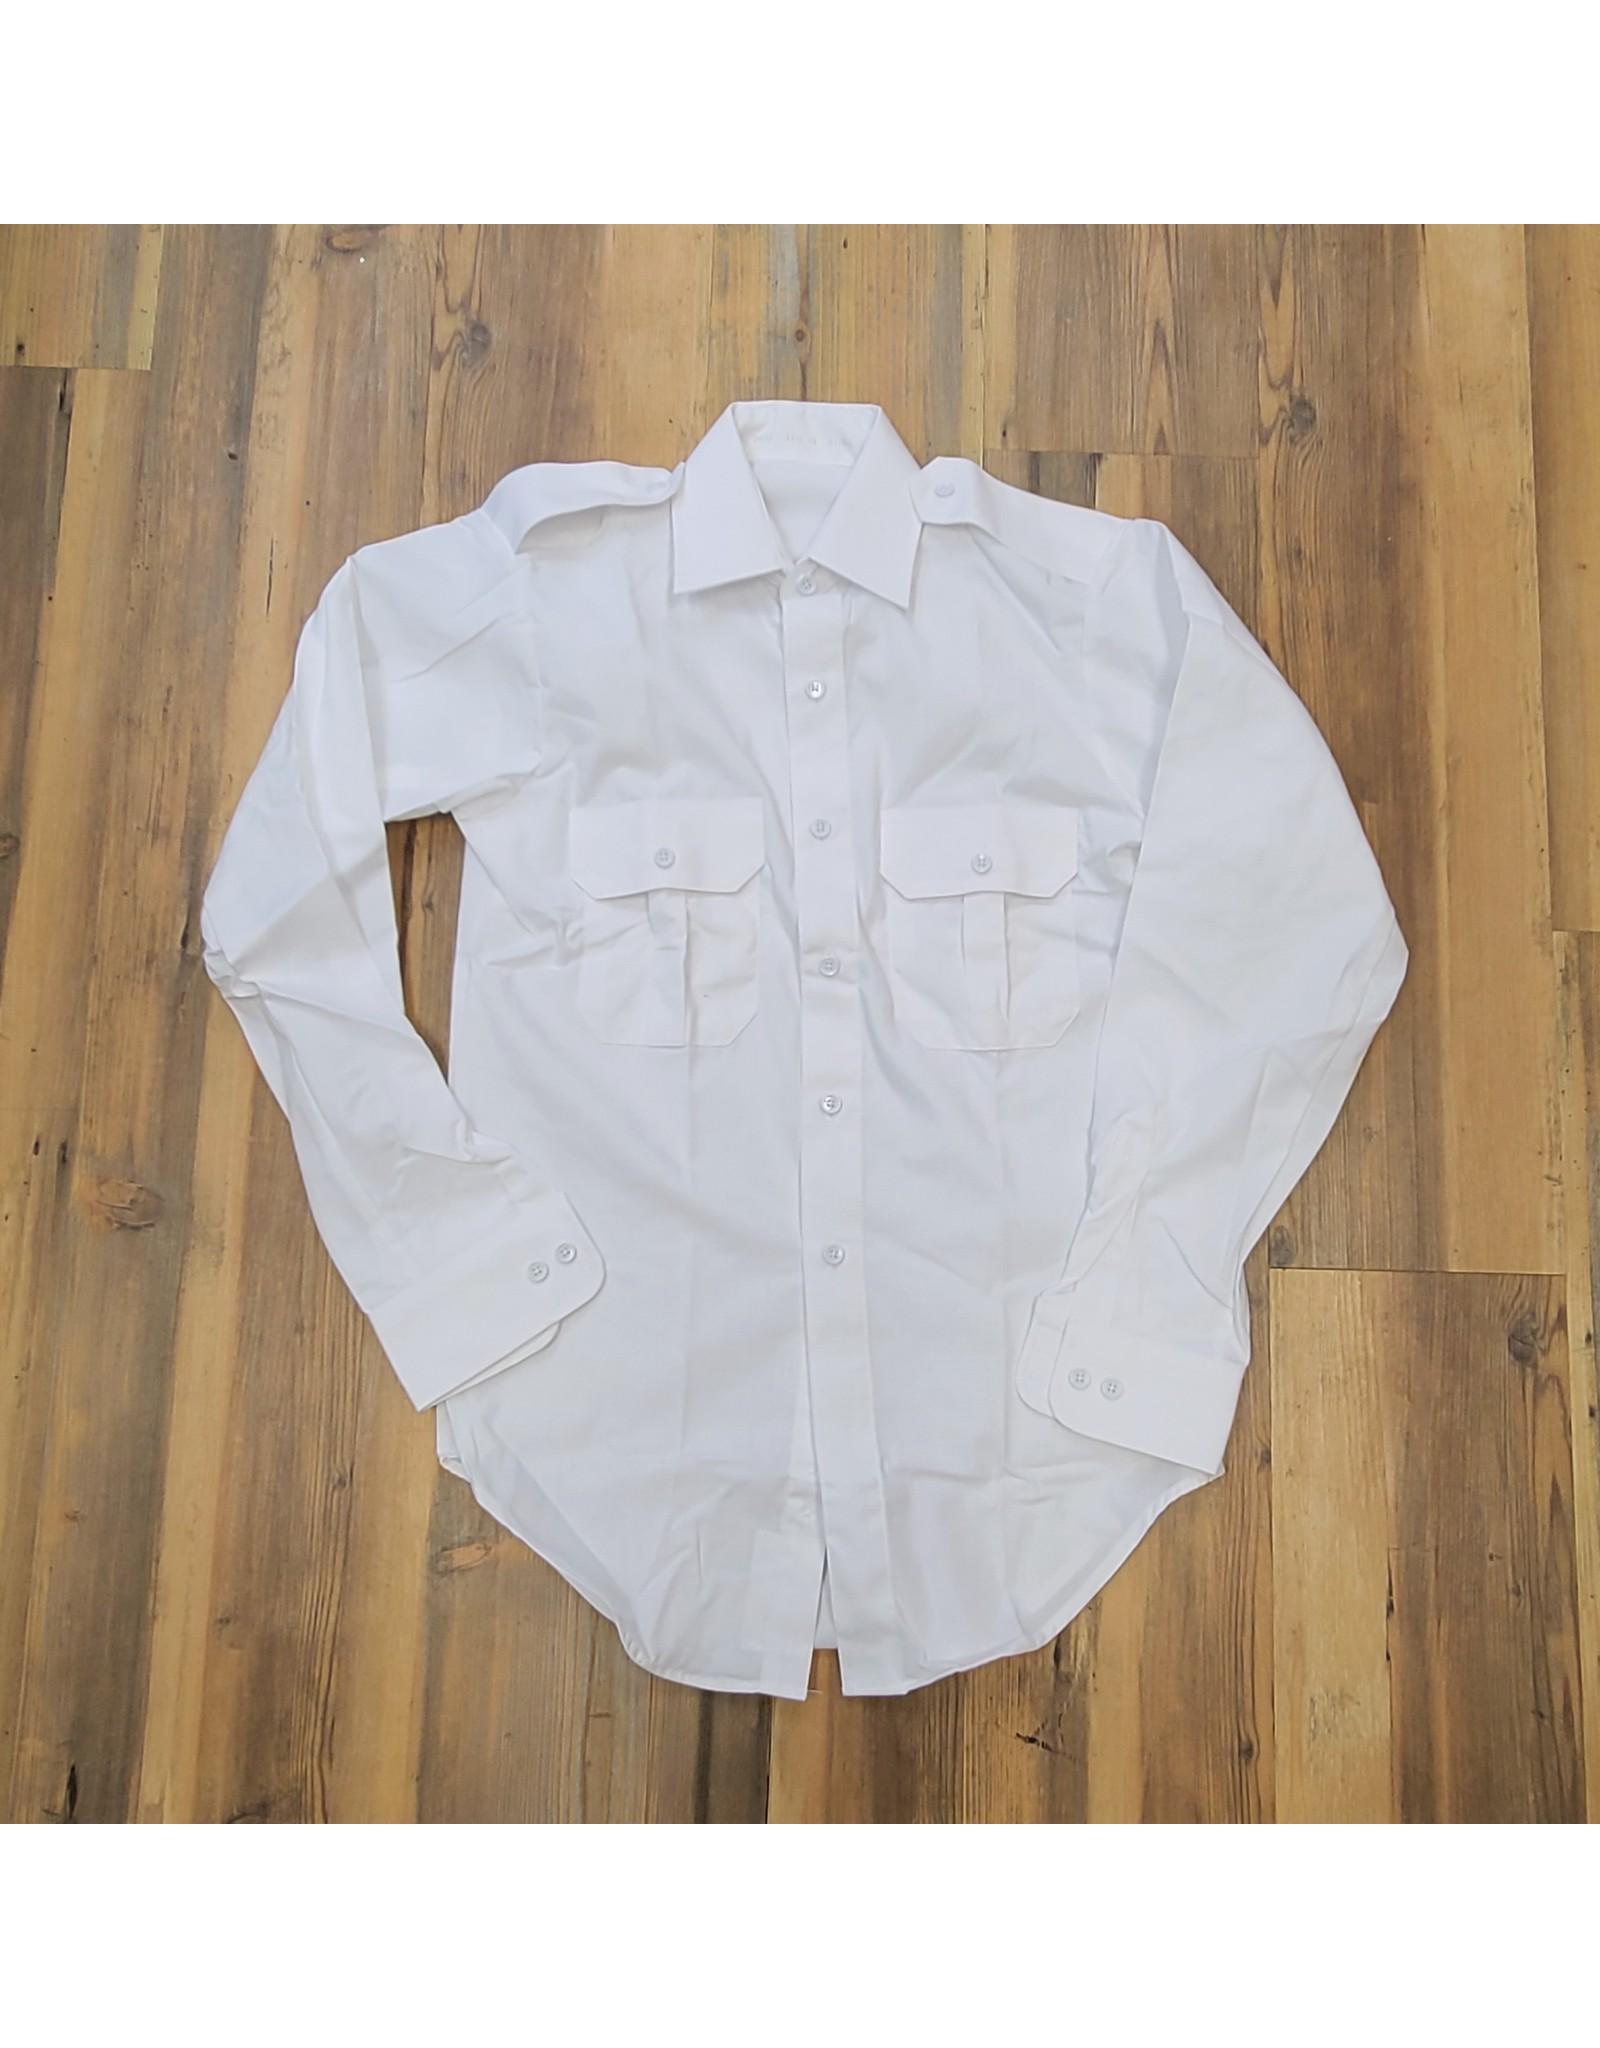 CANADIAN SURPLUS MEN'S WHITE DRESS LONG SLEEVE-USED